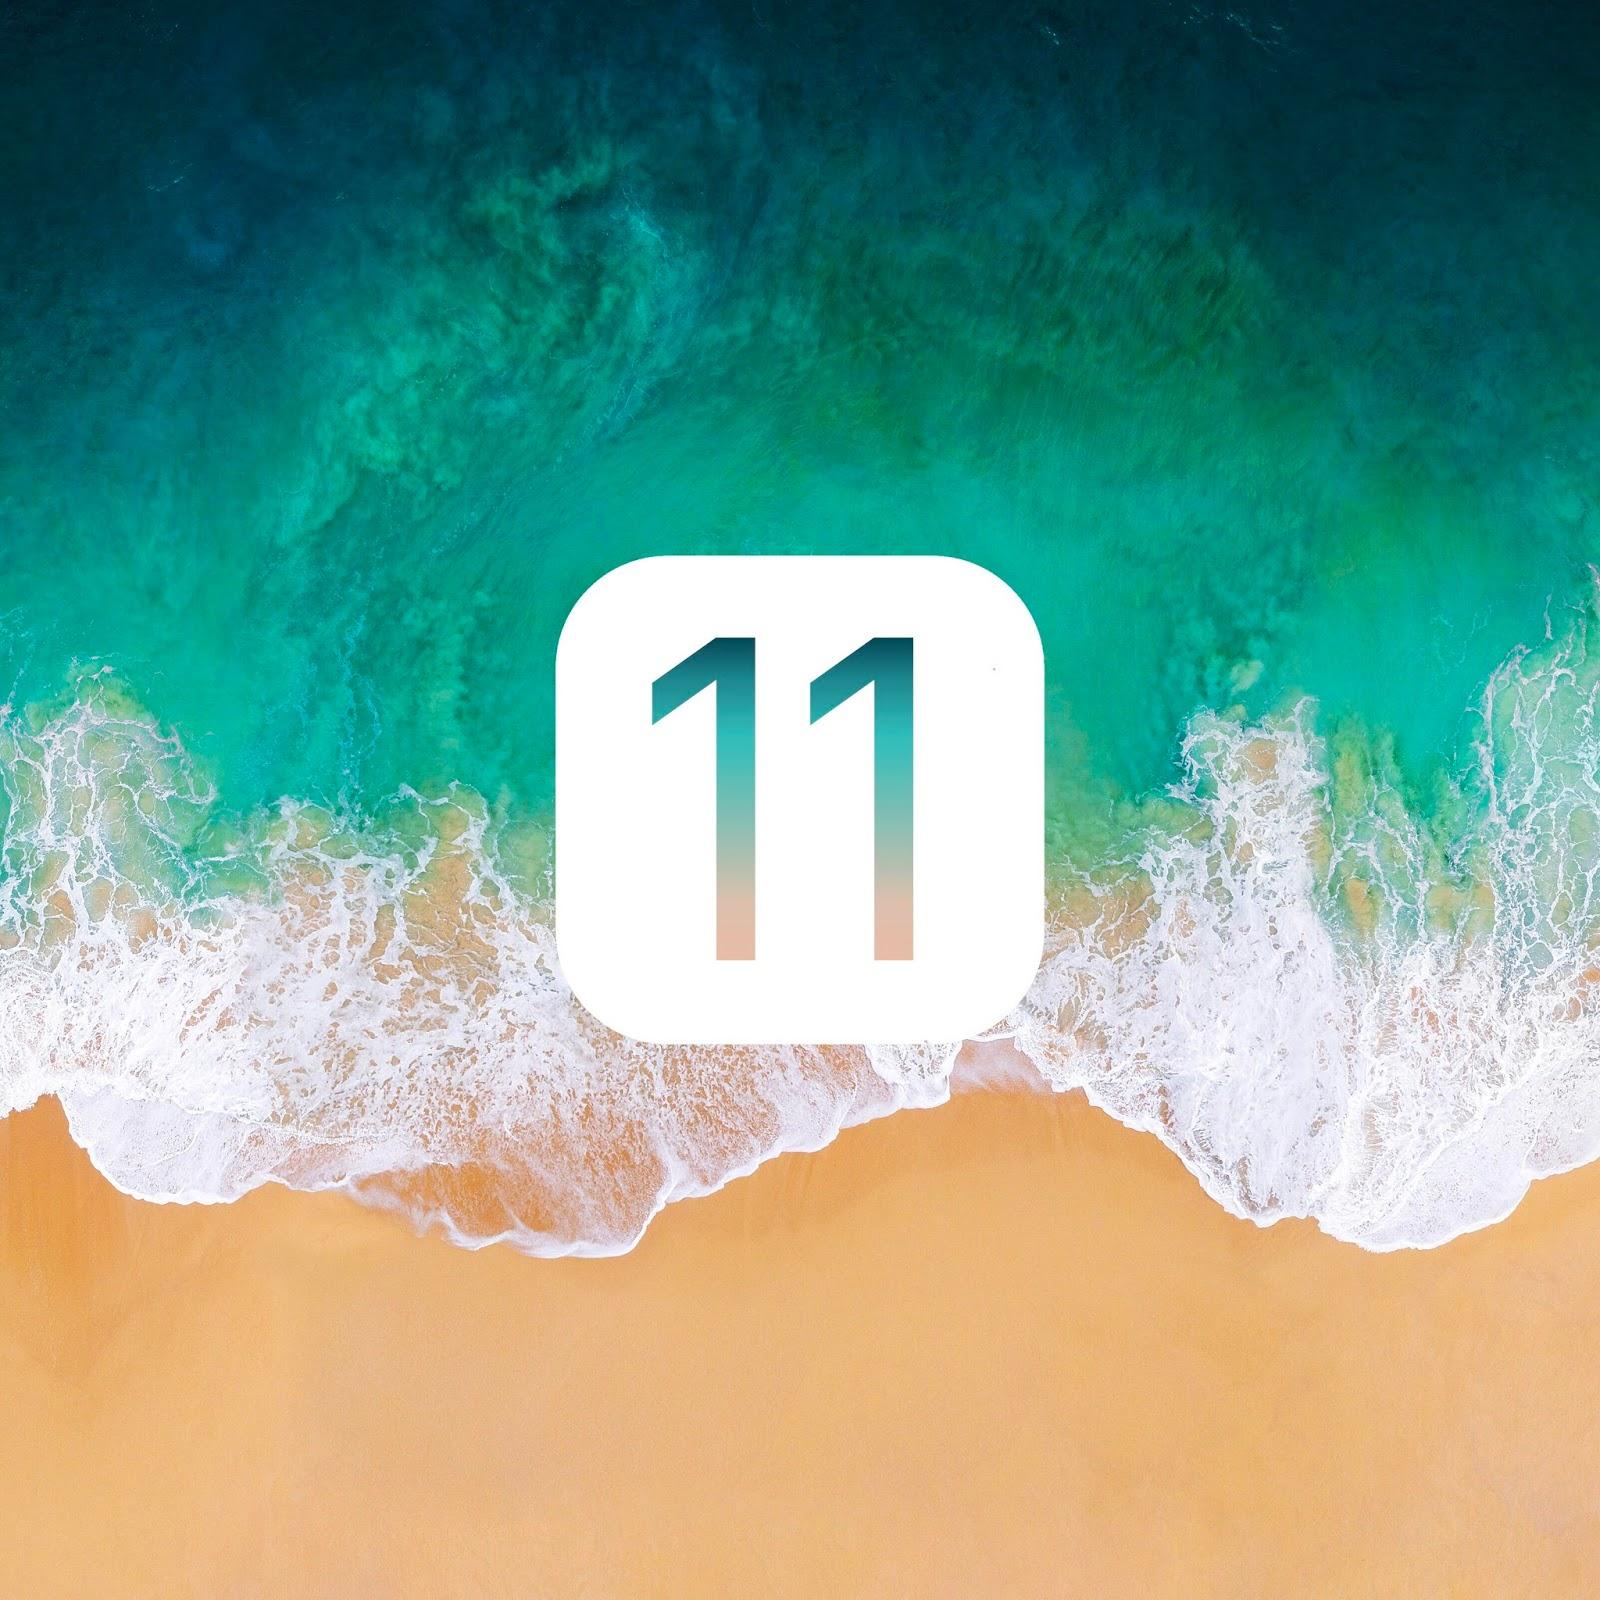 Best Iphone 11 Wallpaper: Download IOS 11 Wallpaper IPhone / IPad HD Resolution